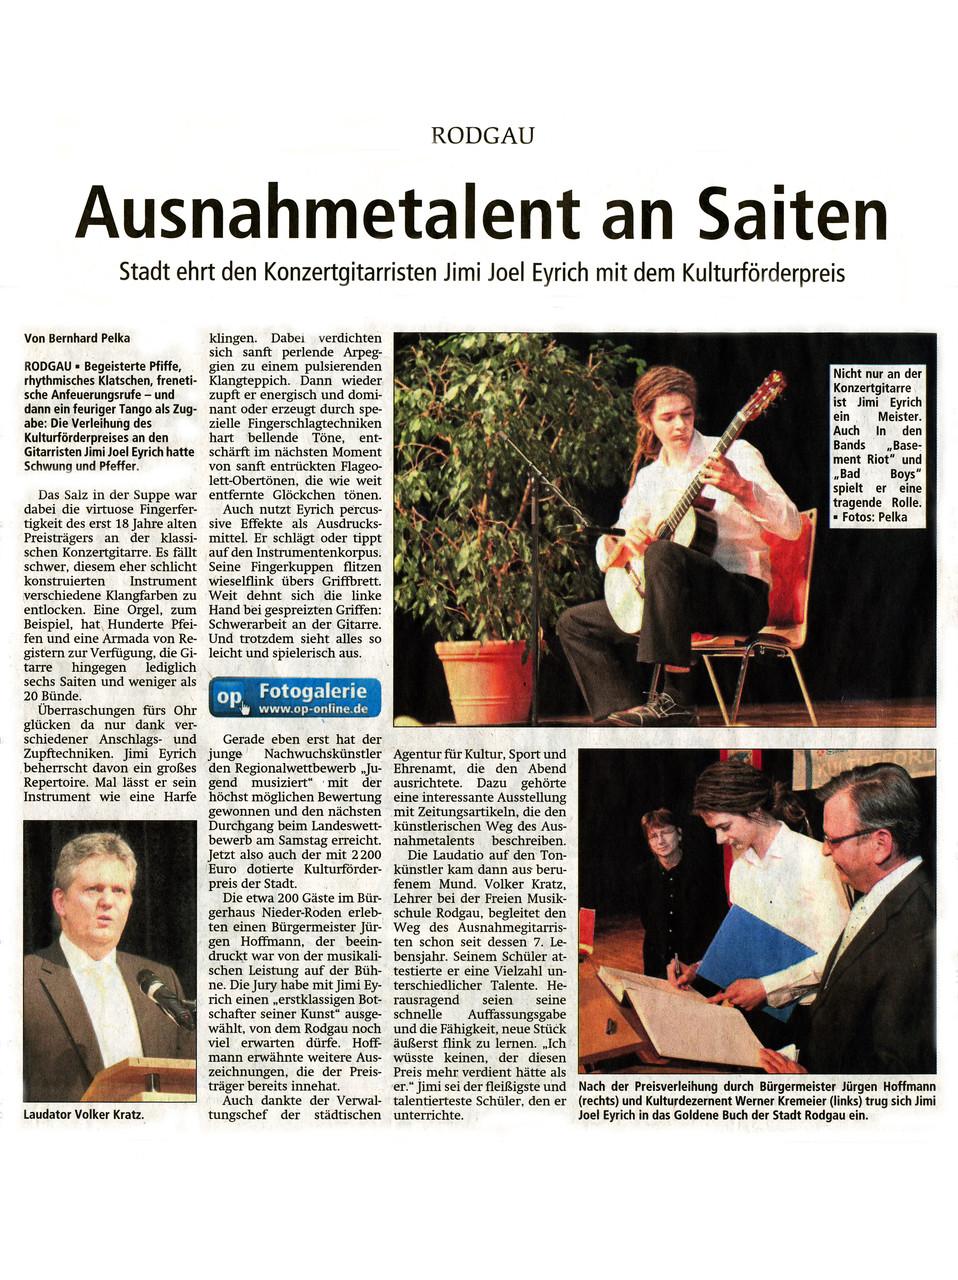 Offenbach Post, 27. März 2015